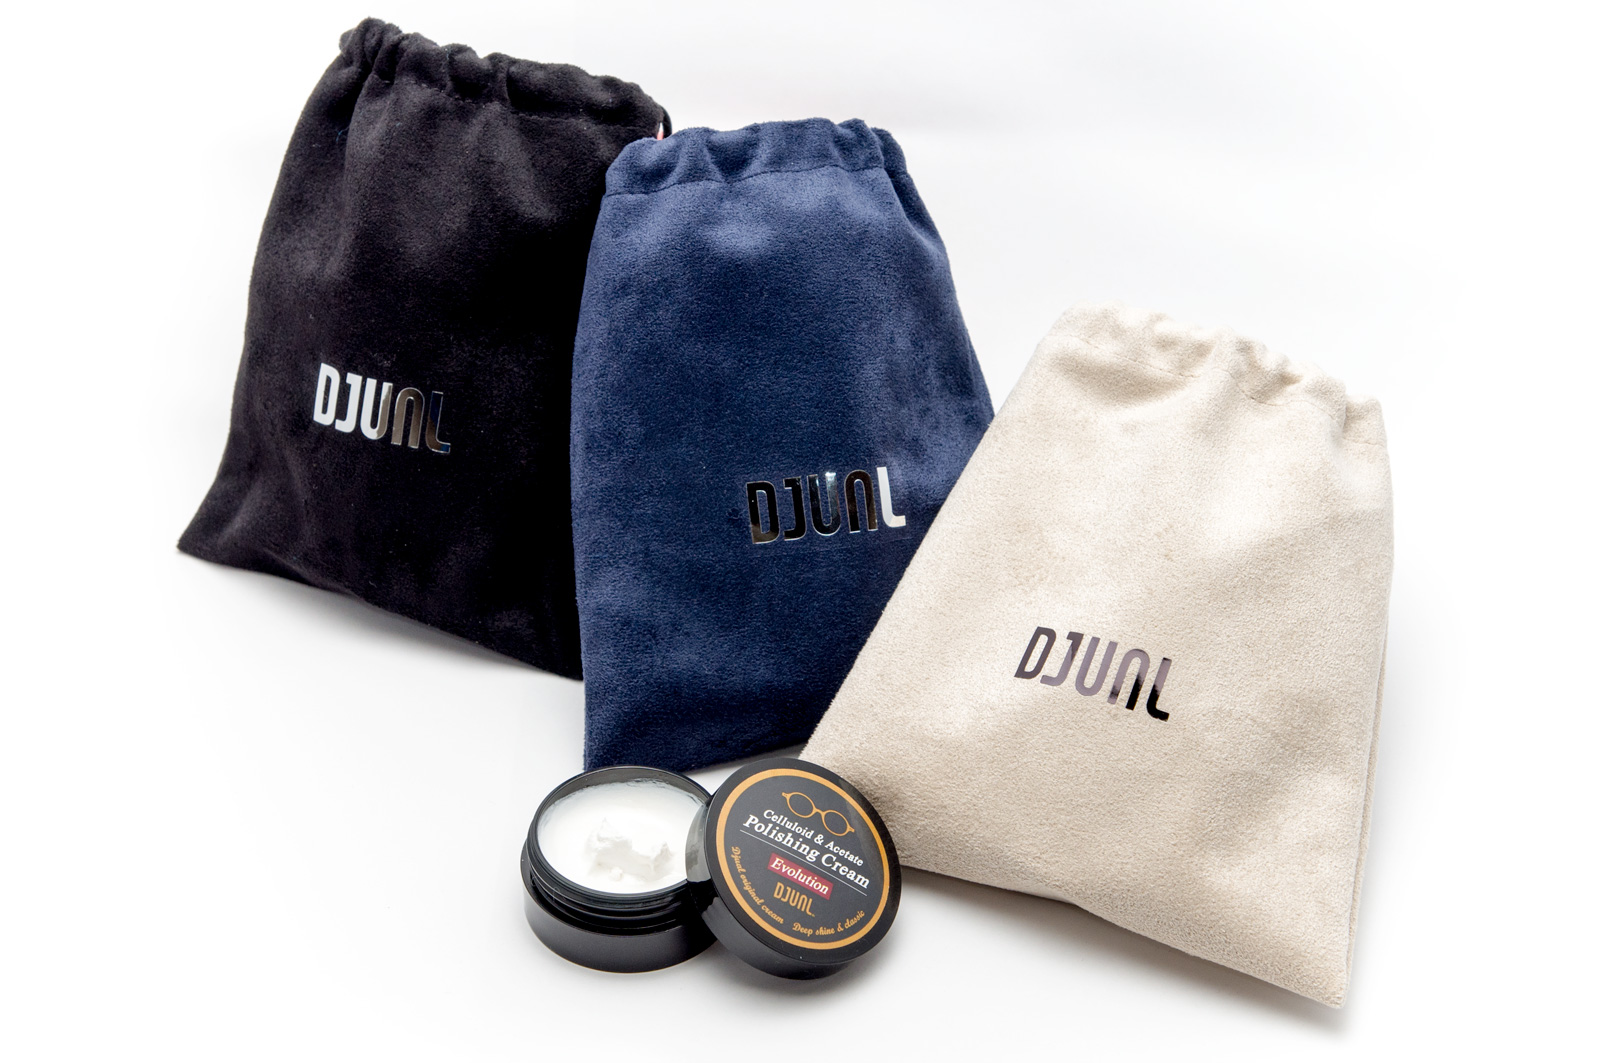 Cell frame polishing DJUAL (dual) celluloid & アセテートポリッシングクリーム